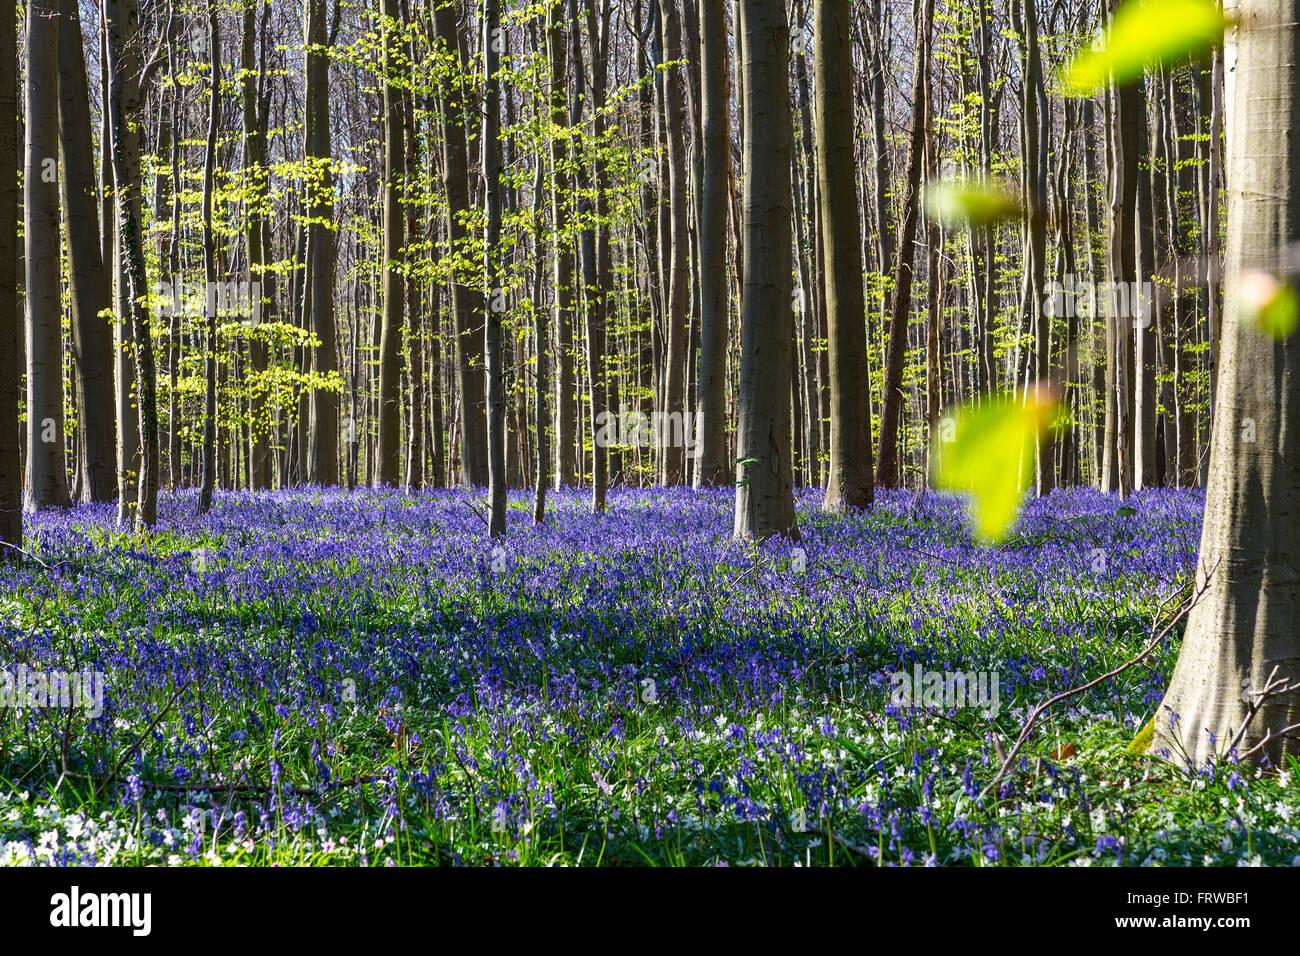 Bluebells, Tranendal lacrima (valle) in Hallerbos, Belgio Immagini Stock